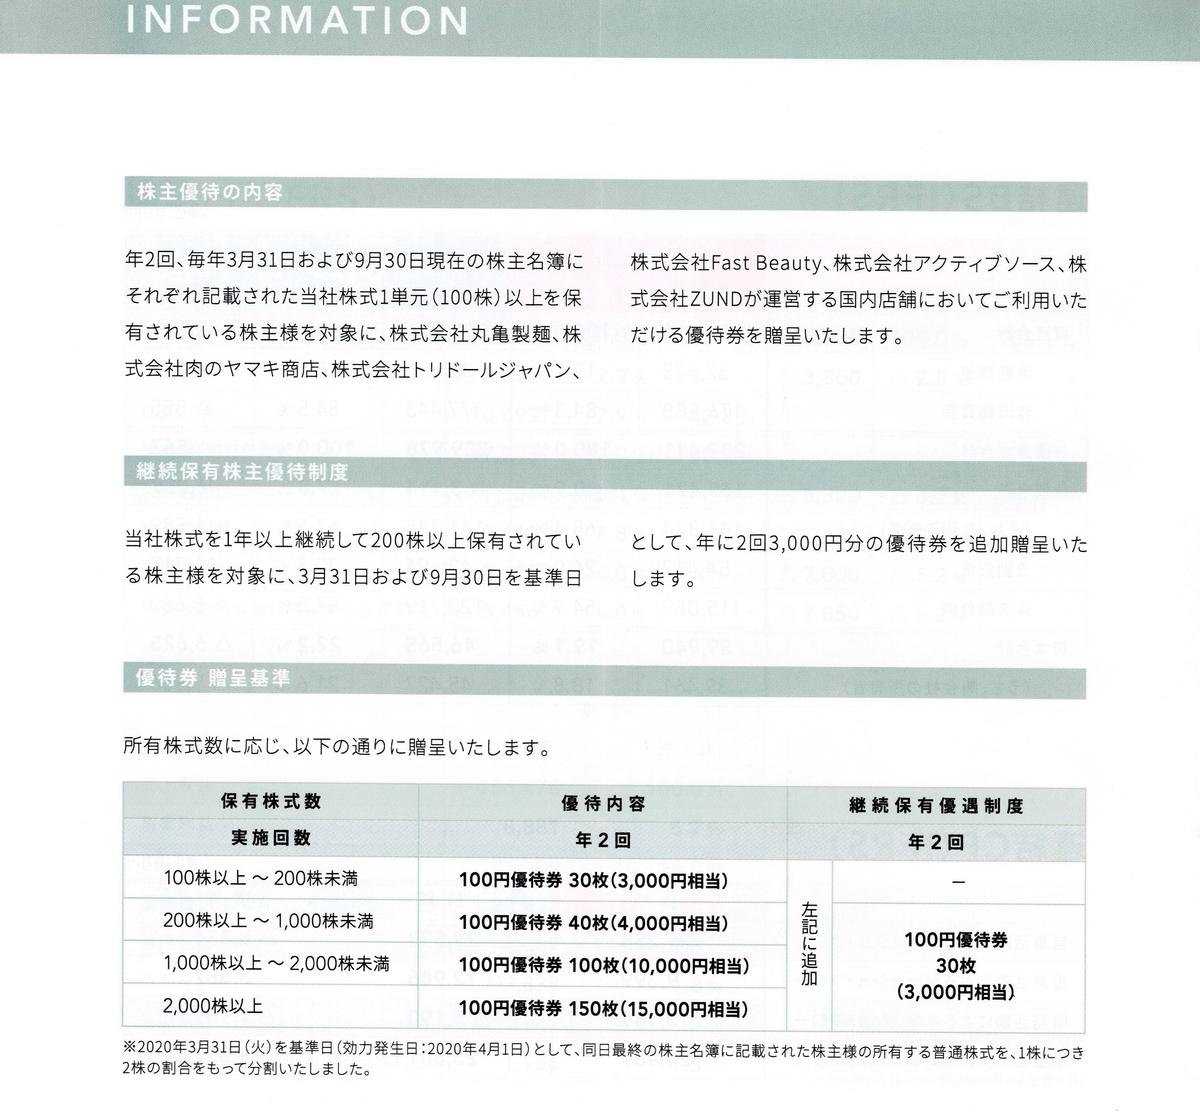 f:id:hanayamatoro:20210616094737j:plain